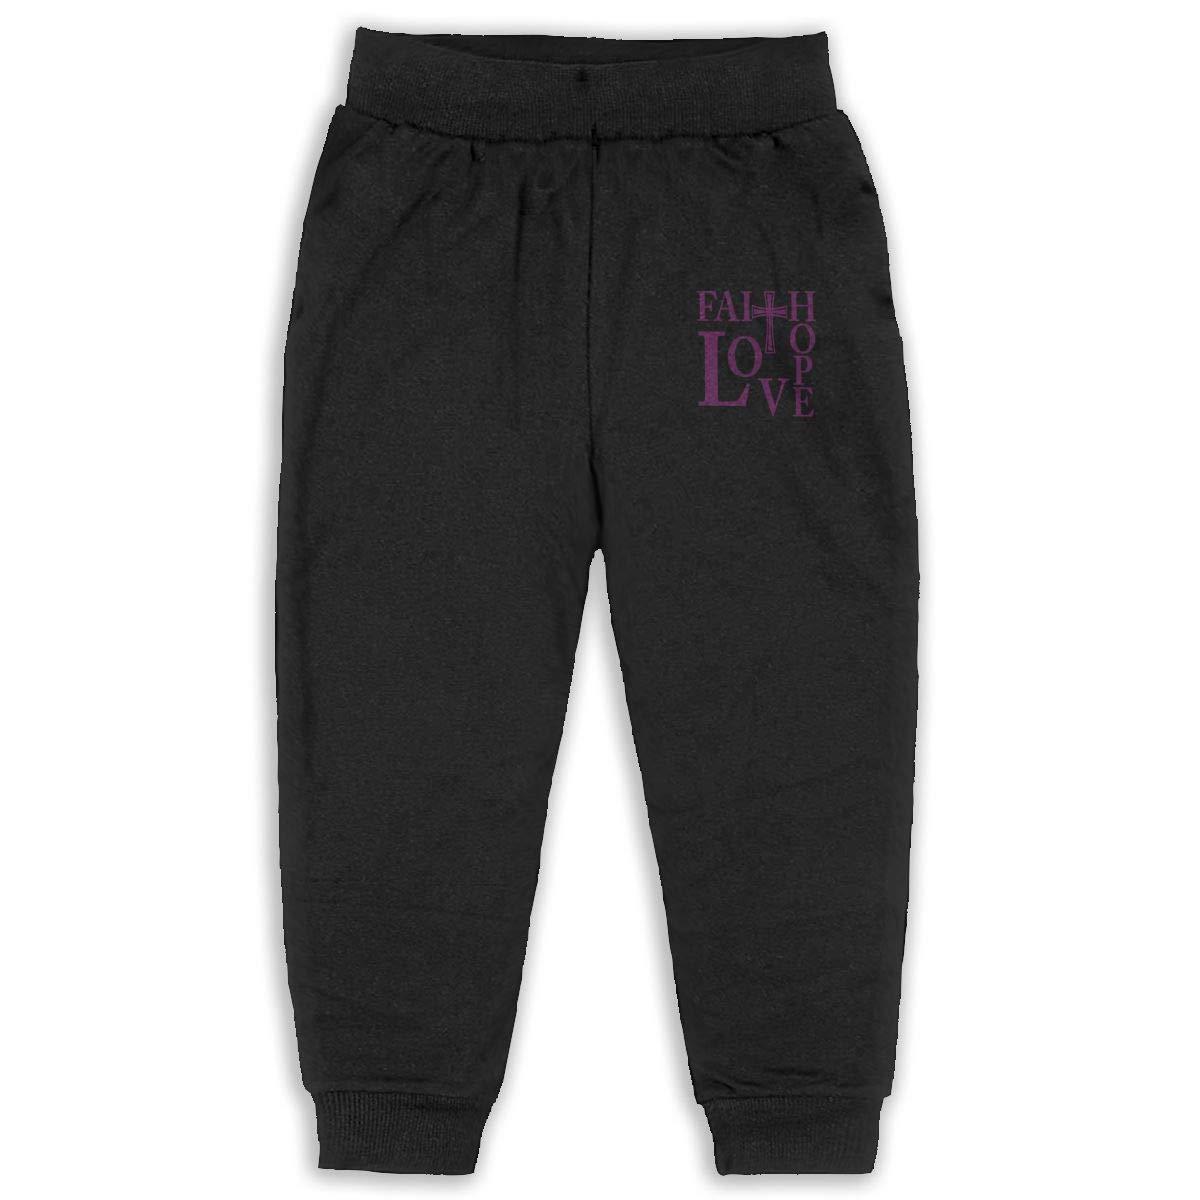 Faith Hope Love Kids Cotton Sweatpants,Jogger Long Jersey Sweatpants